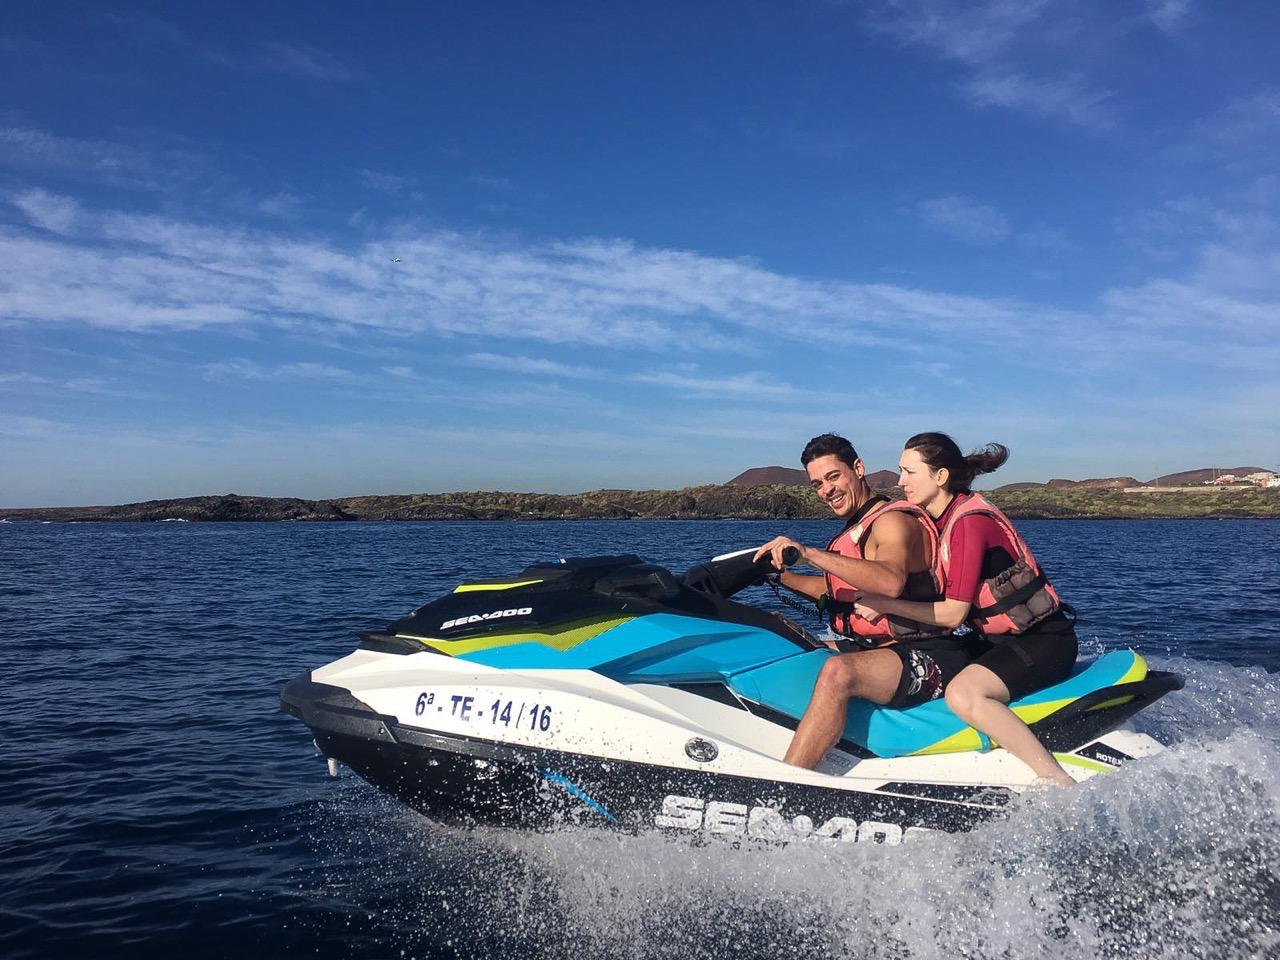 Cheap jet skis - Irish restaurant miami